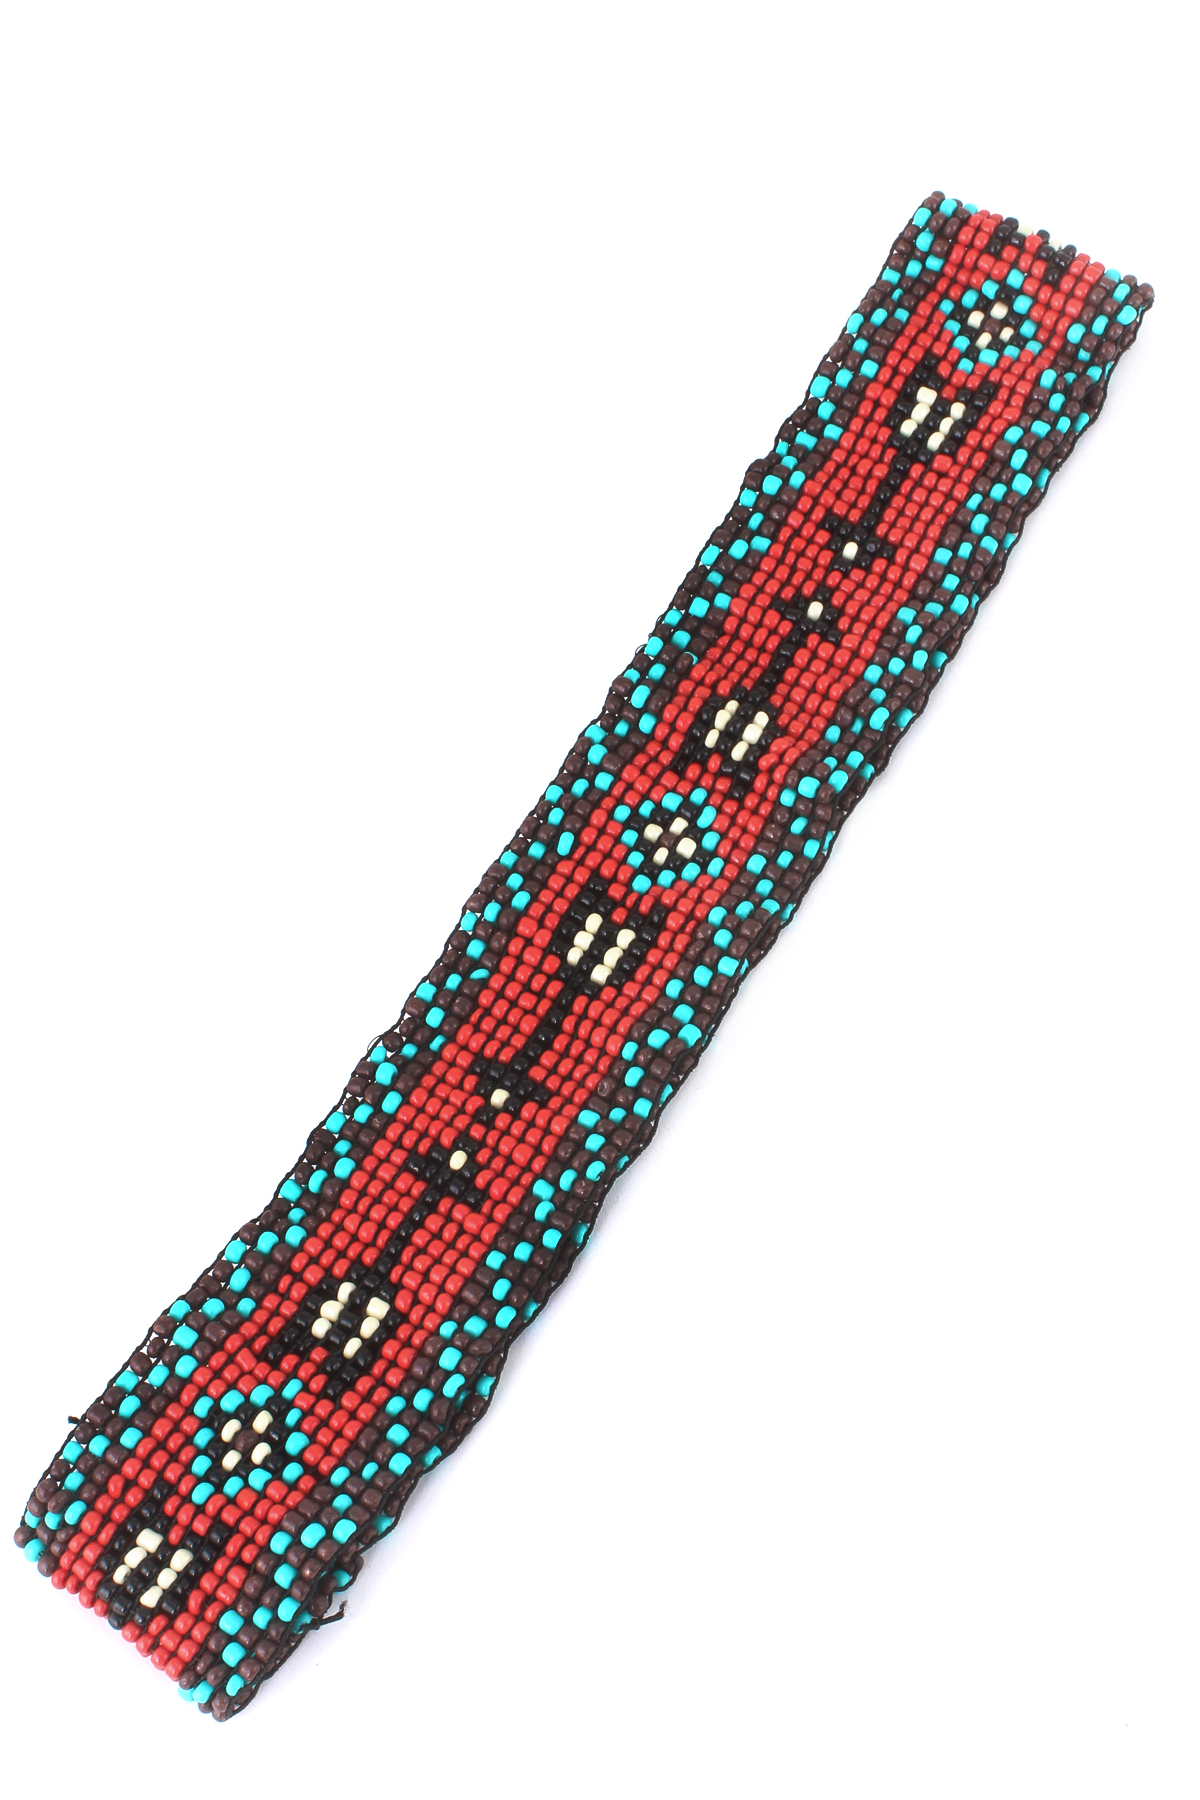 arrow pattern seed bead headband hair accessories